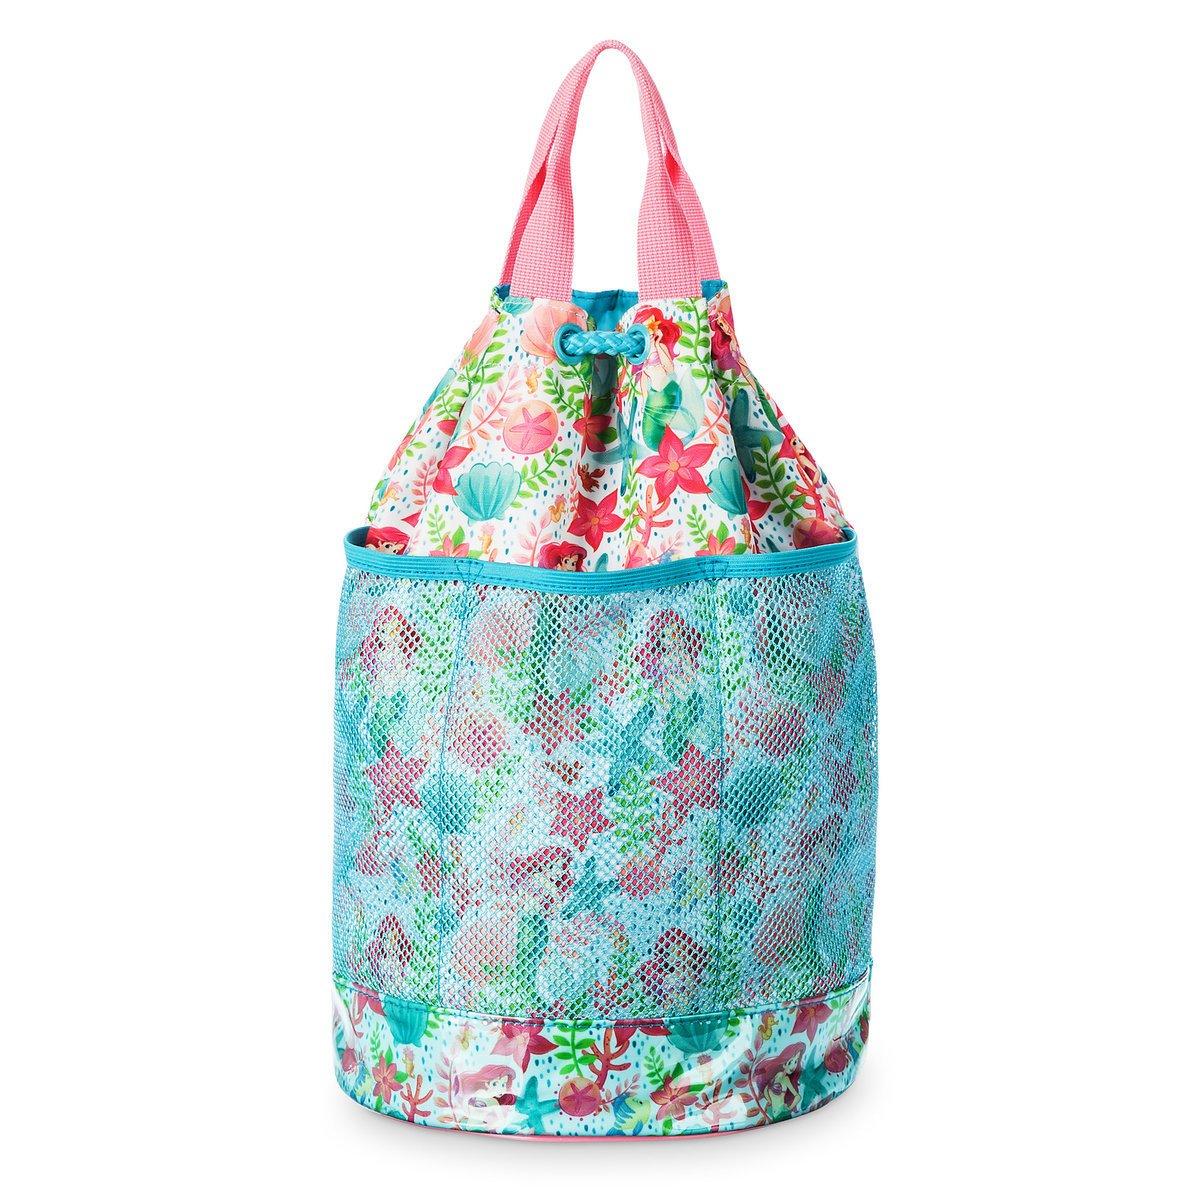 Swim Ariel Bag for Kids W Cinch Top Closure